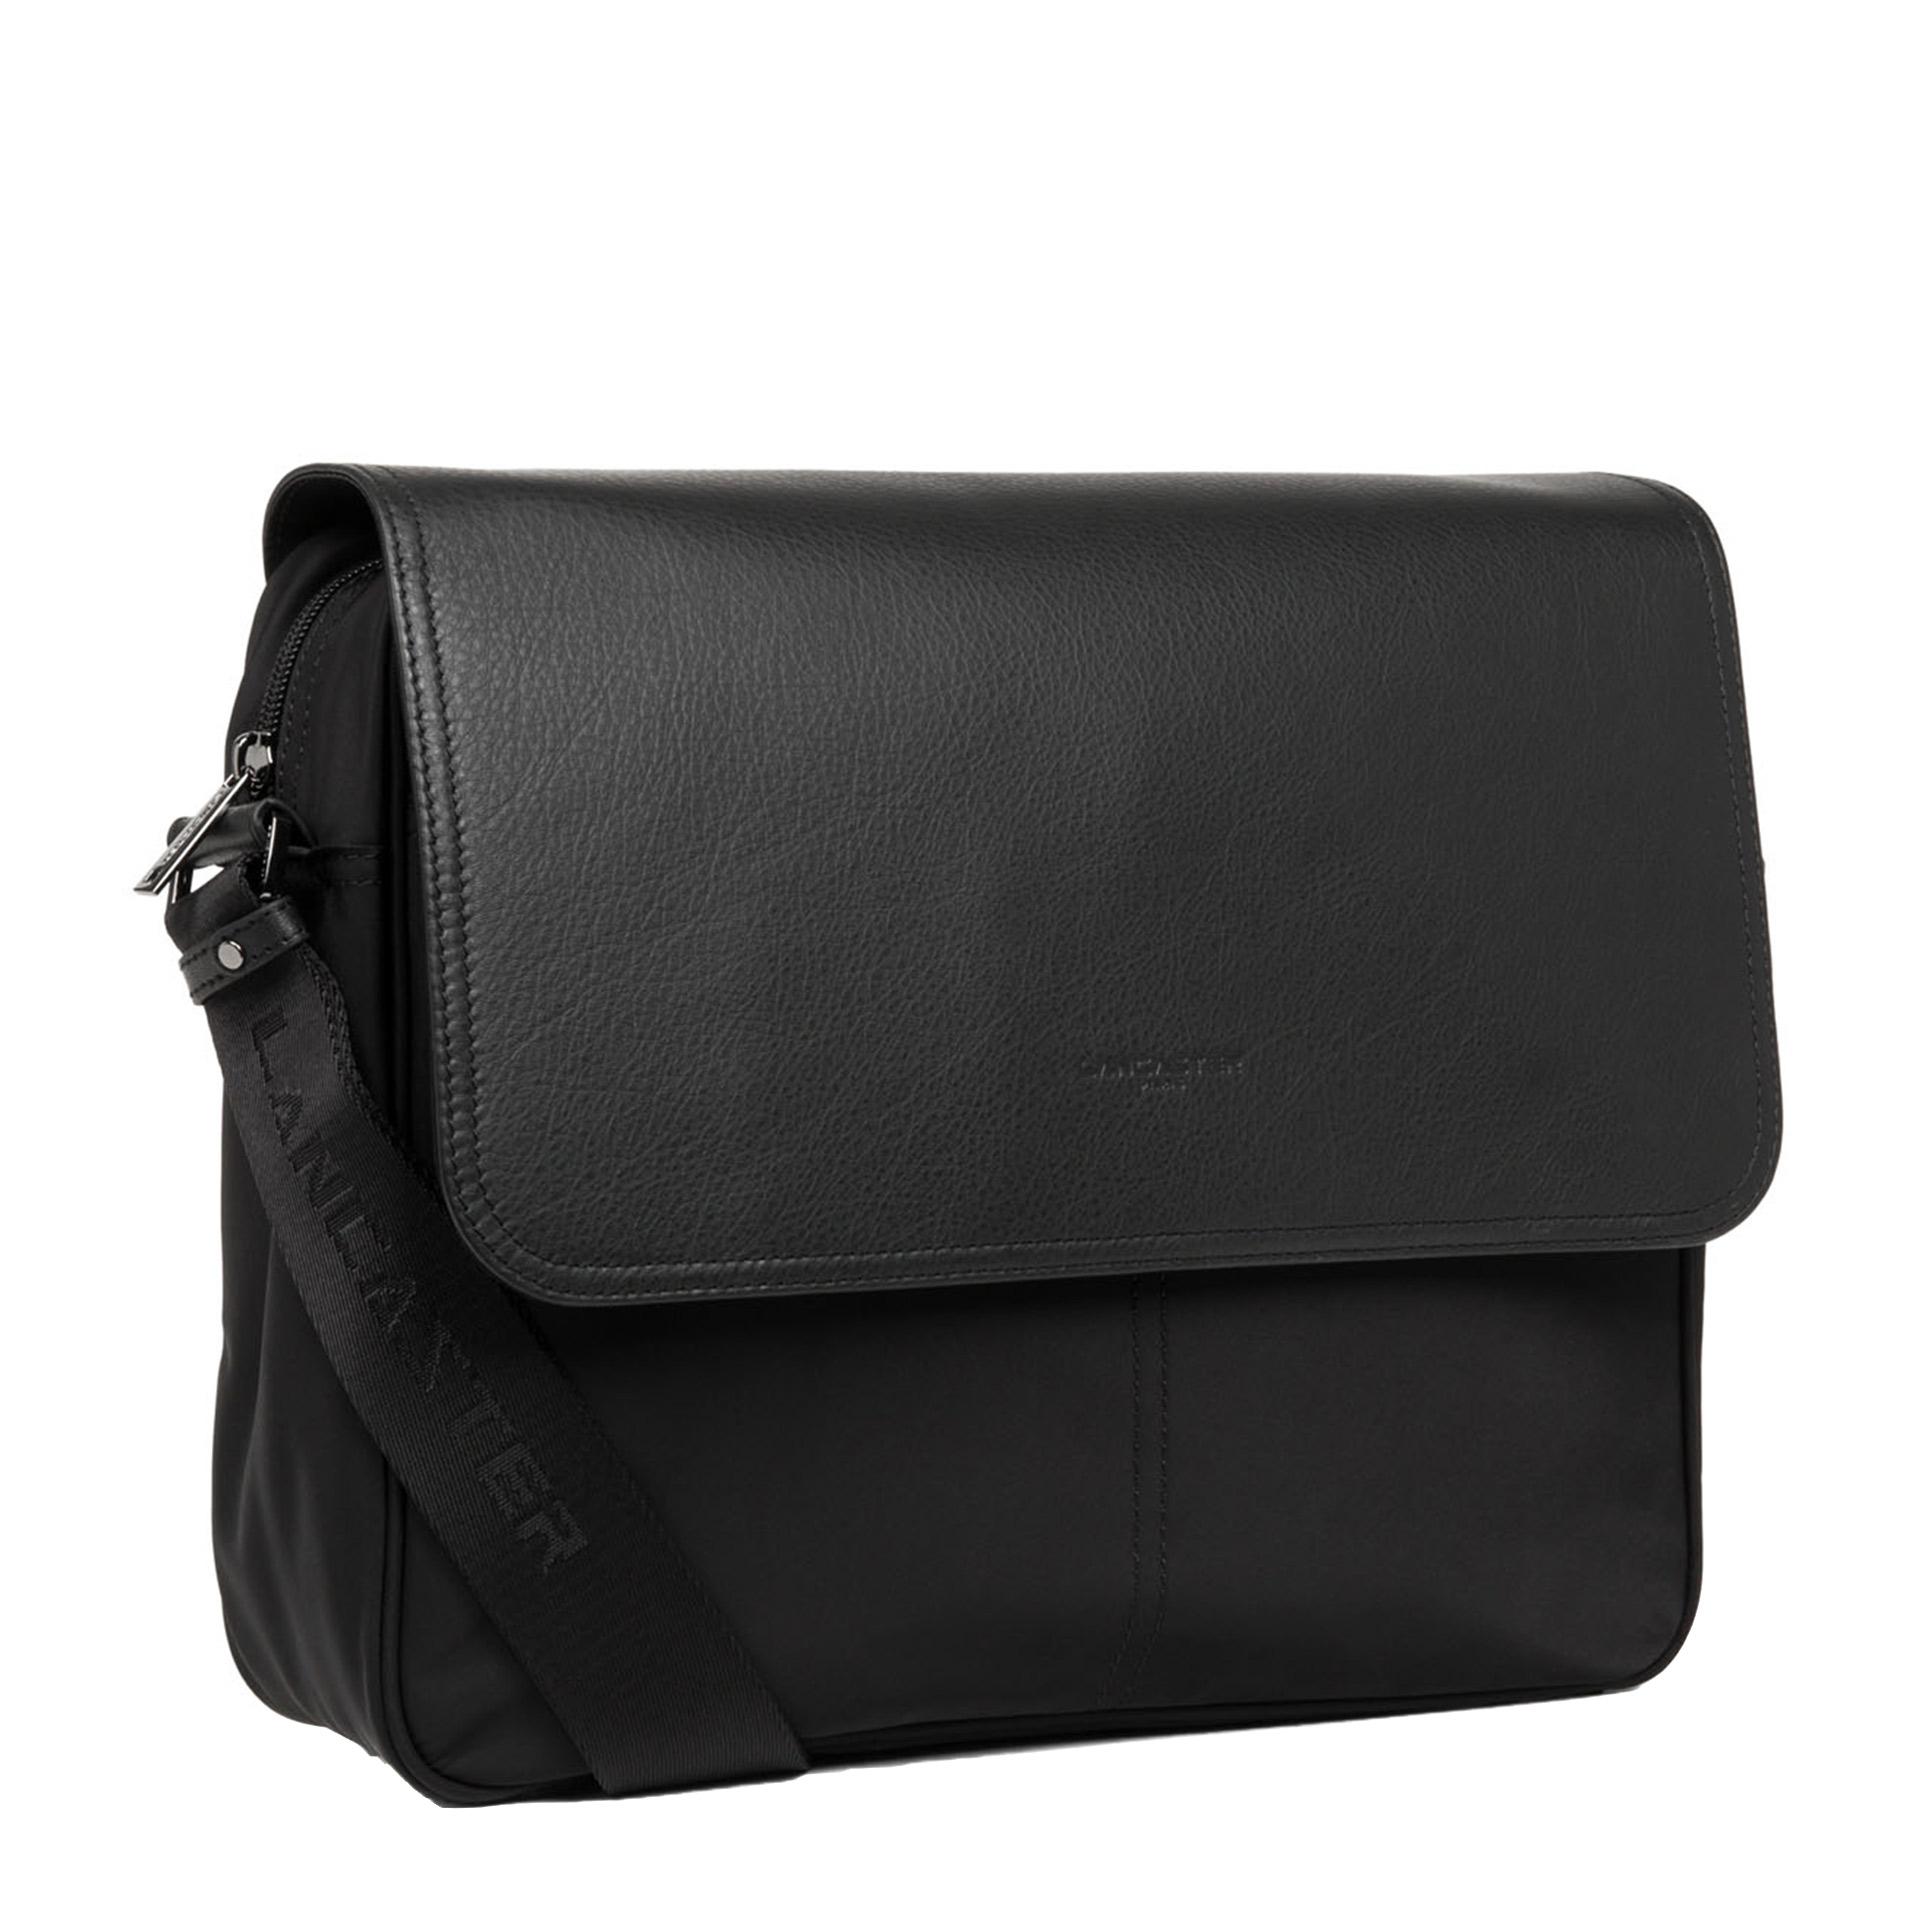 Basic Sport Men's Businesstasche noir